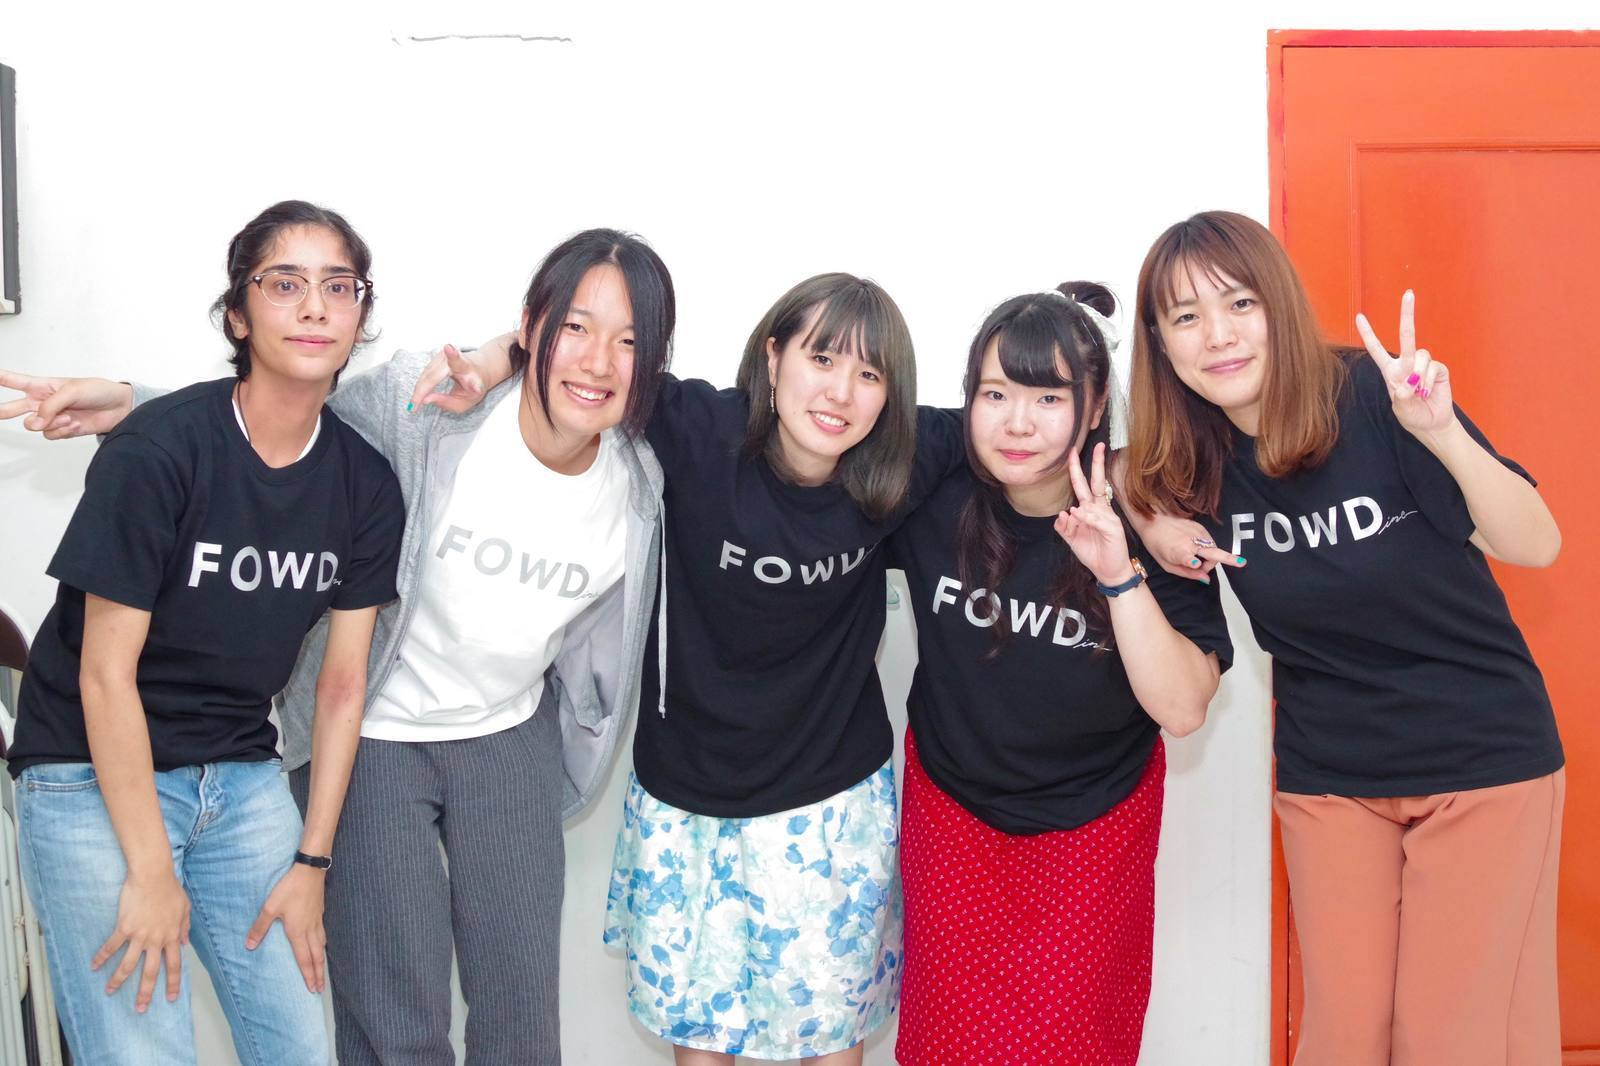 【JavaScript】今、話題のチャット小説アプリ運営企業にてフロントエンドエンジニア募集!